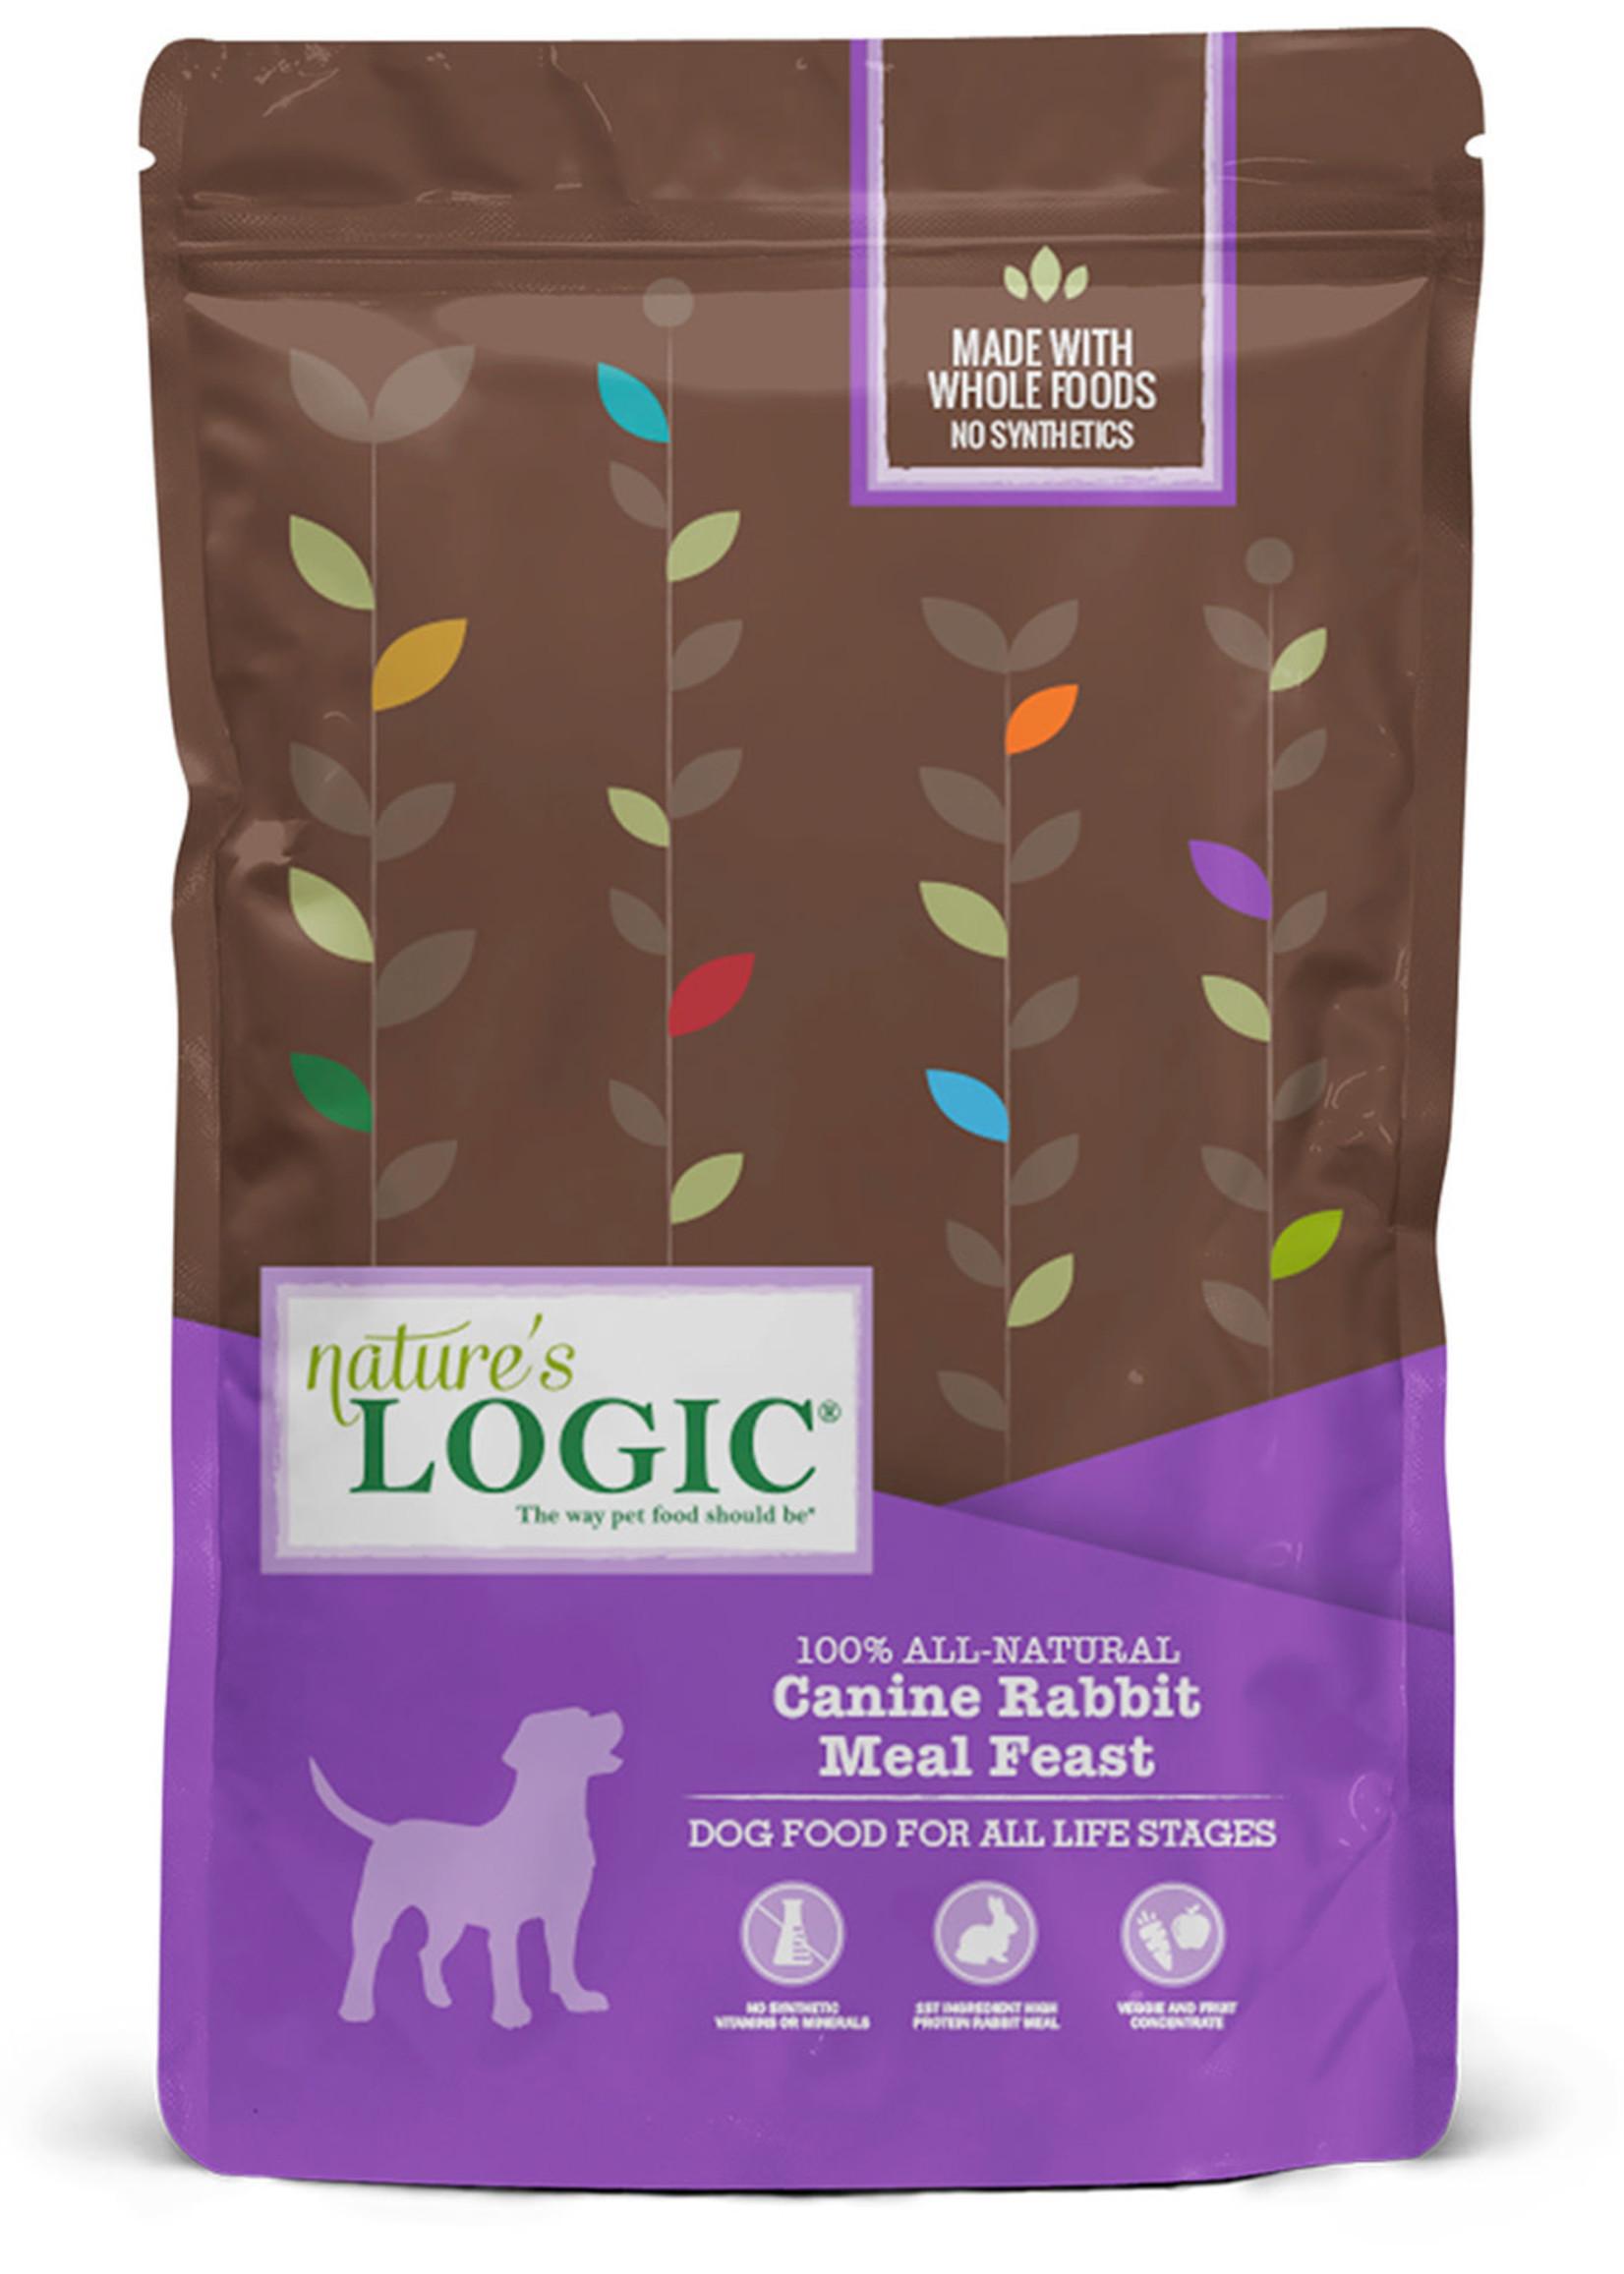 Nature's Logic Nature's Logic Rabbit Meal Feast Dry Dog Food 13lbs